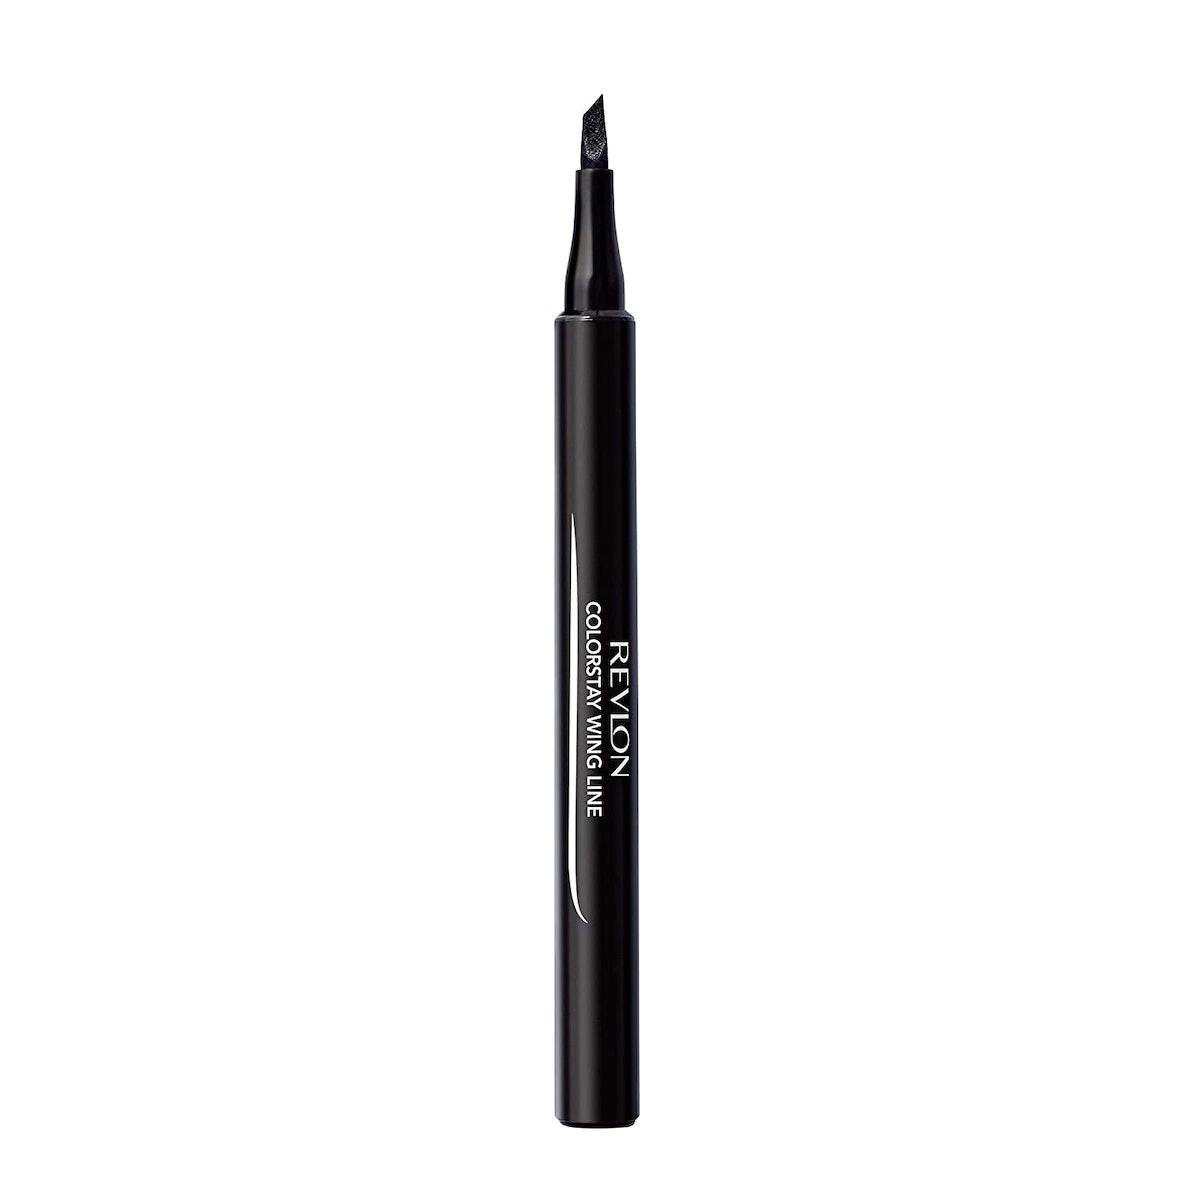 Revlon ColorStay Liquid Eye Pen